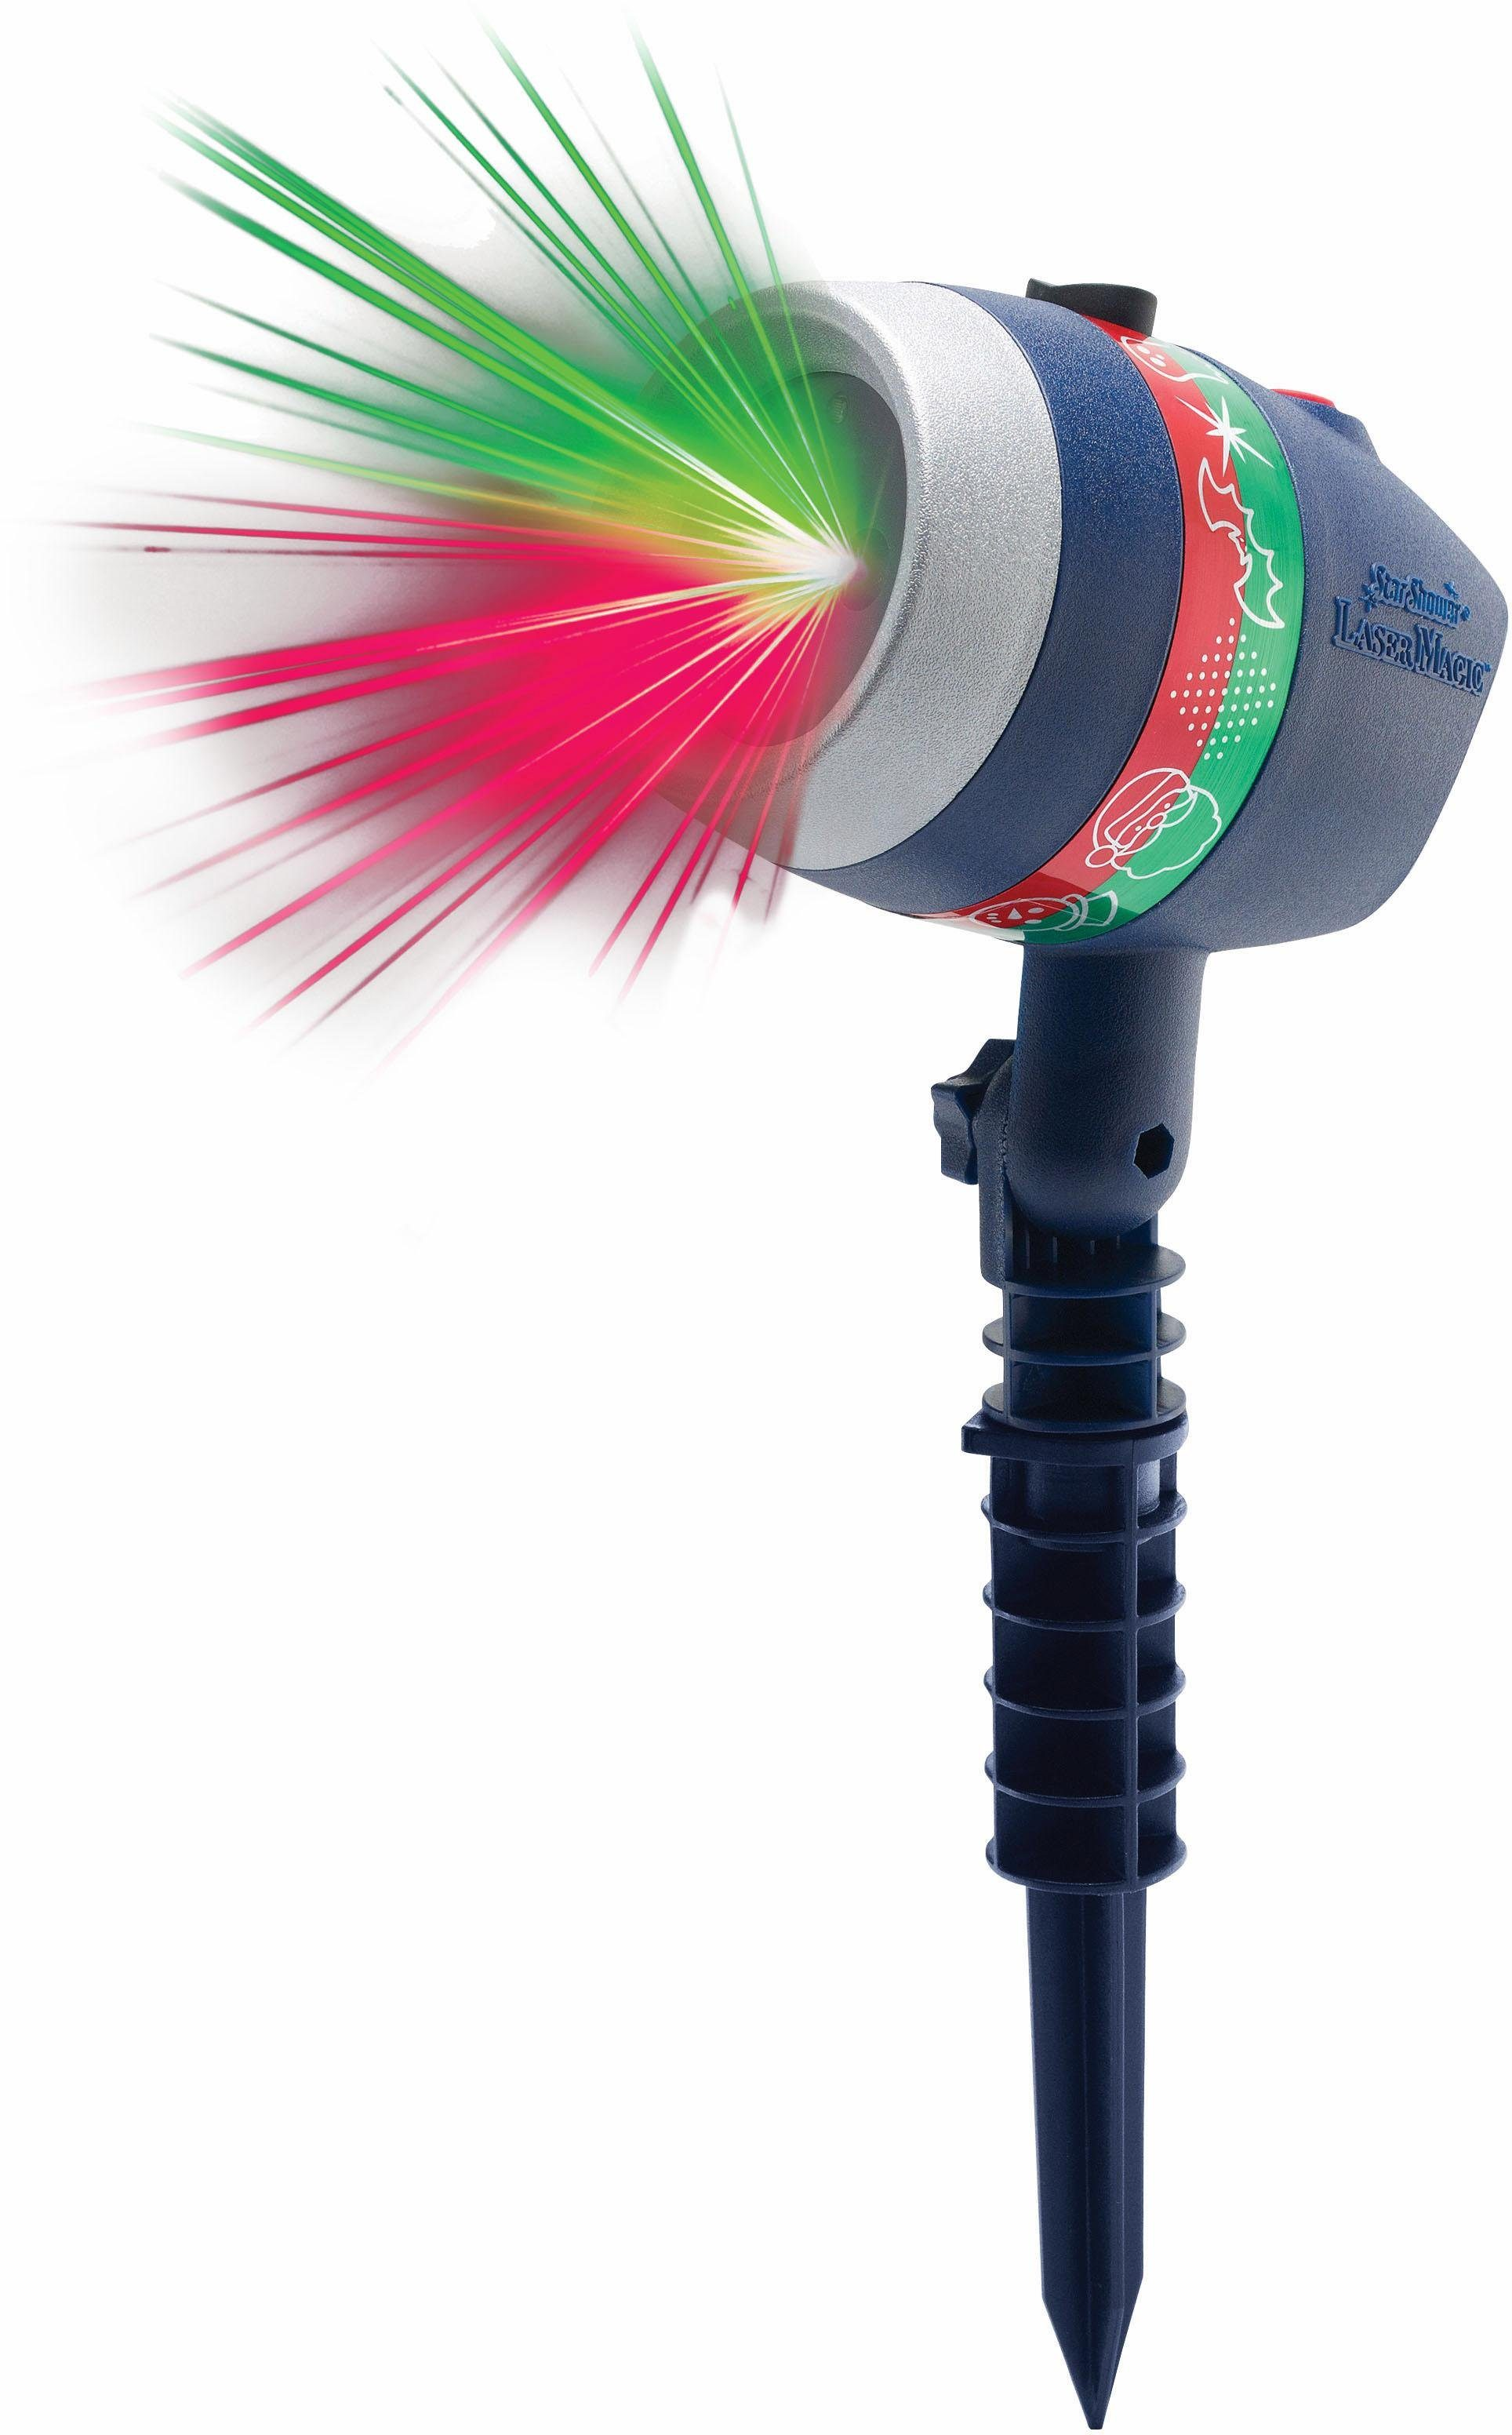 MediaShop Motivstrahler »Star Shower Laser Magic«